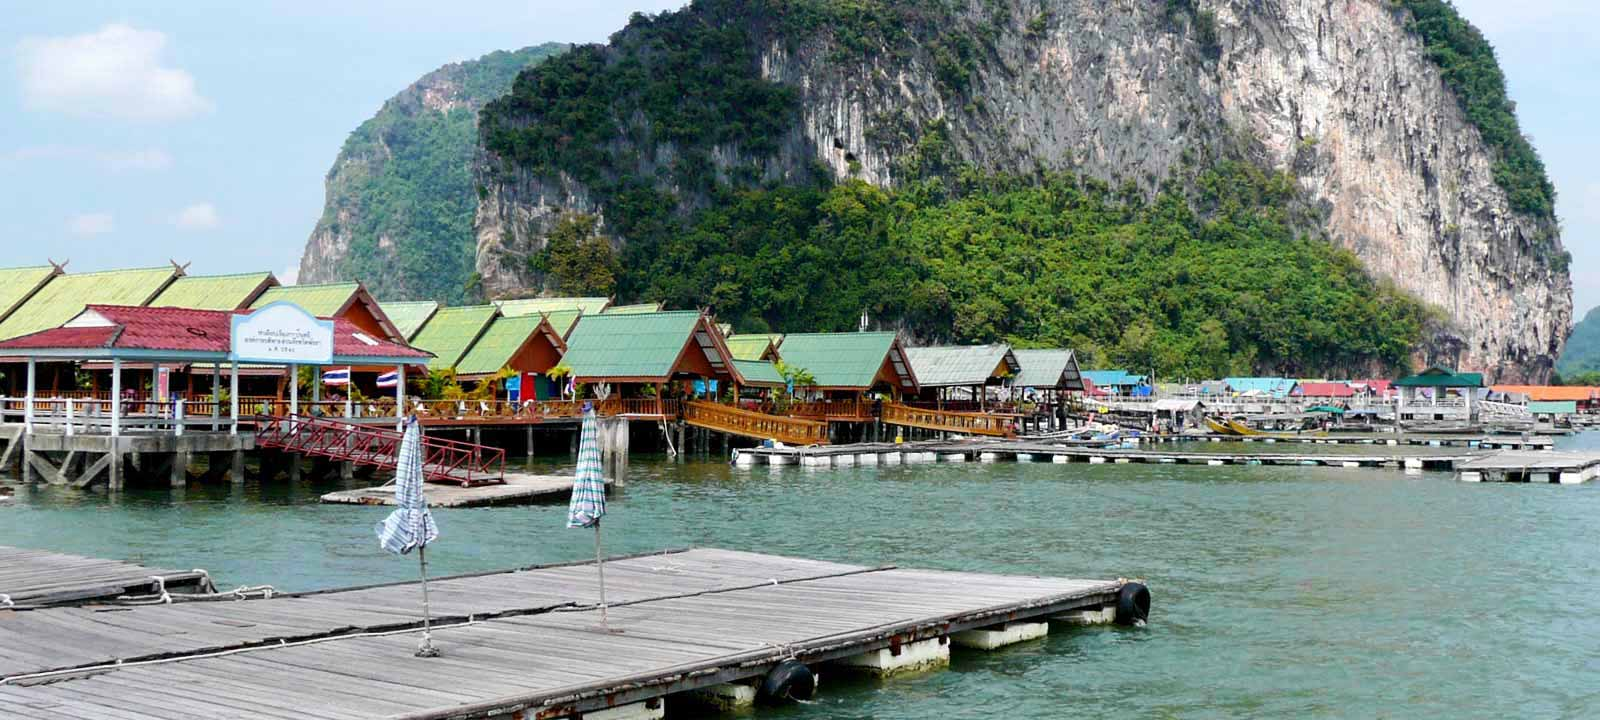 Voyage Phuket, Voyage en Thailande avec Asiatica Travel